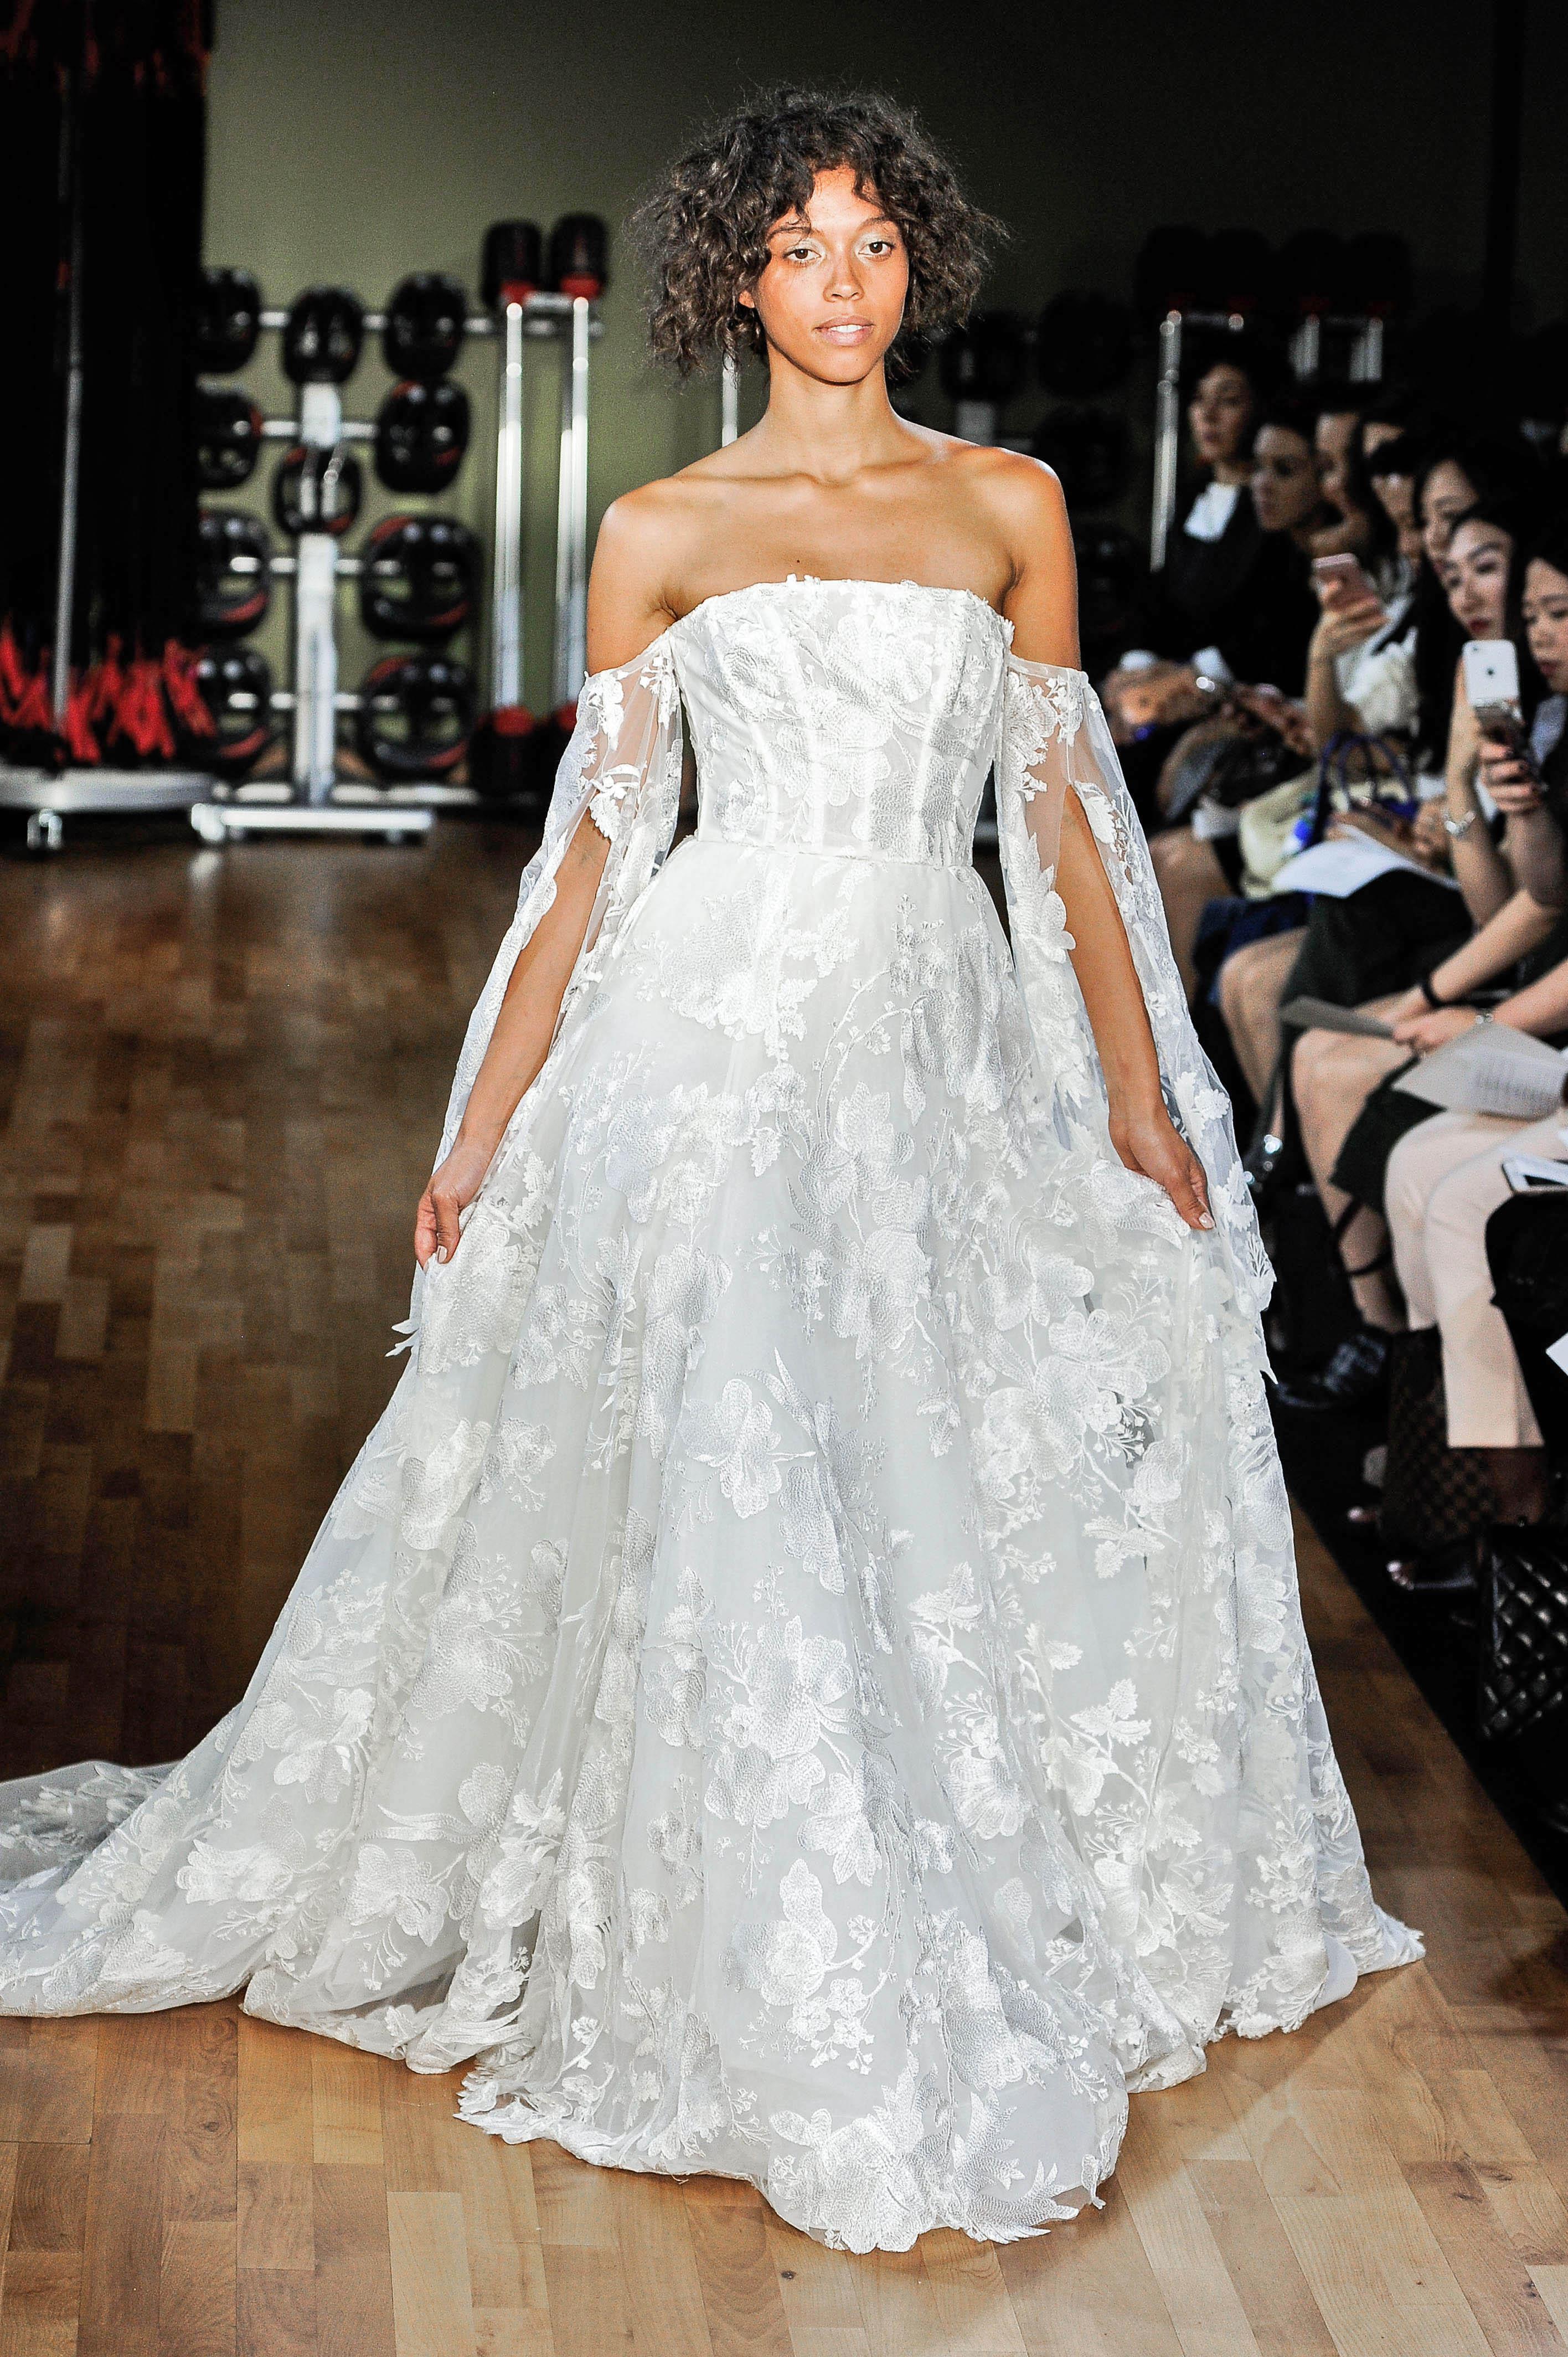 rivini by rita vinieris wedding dress fall 2018 lace off the shoulder a-line